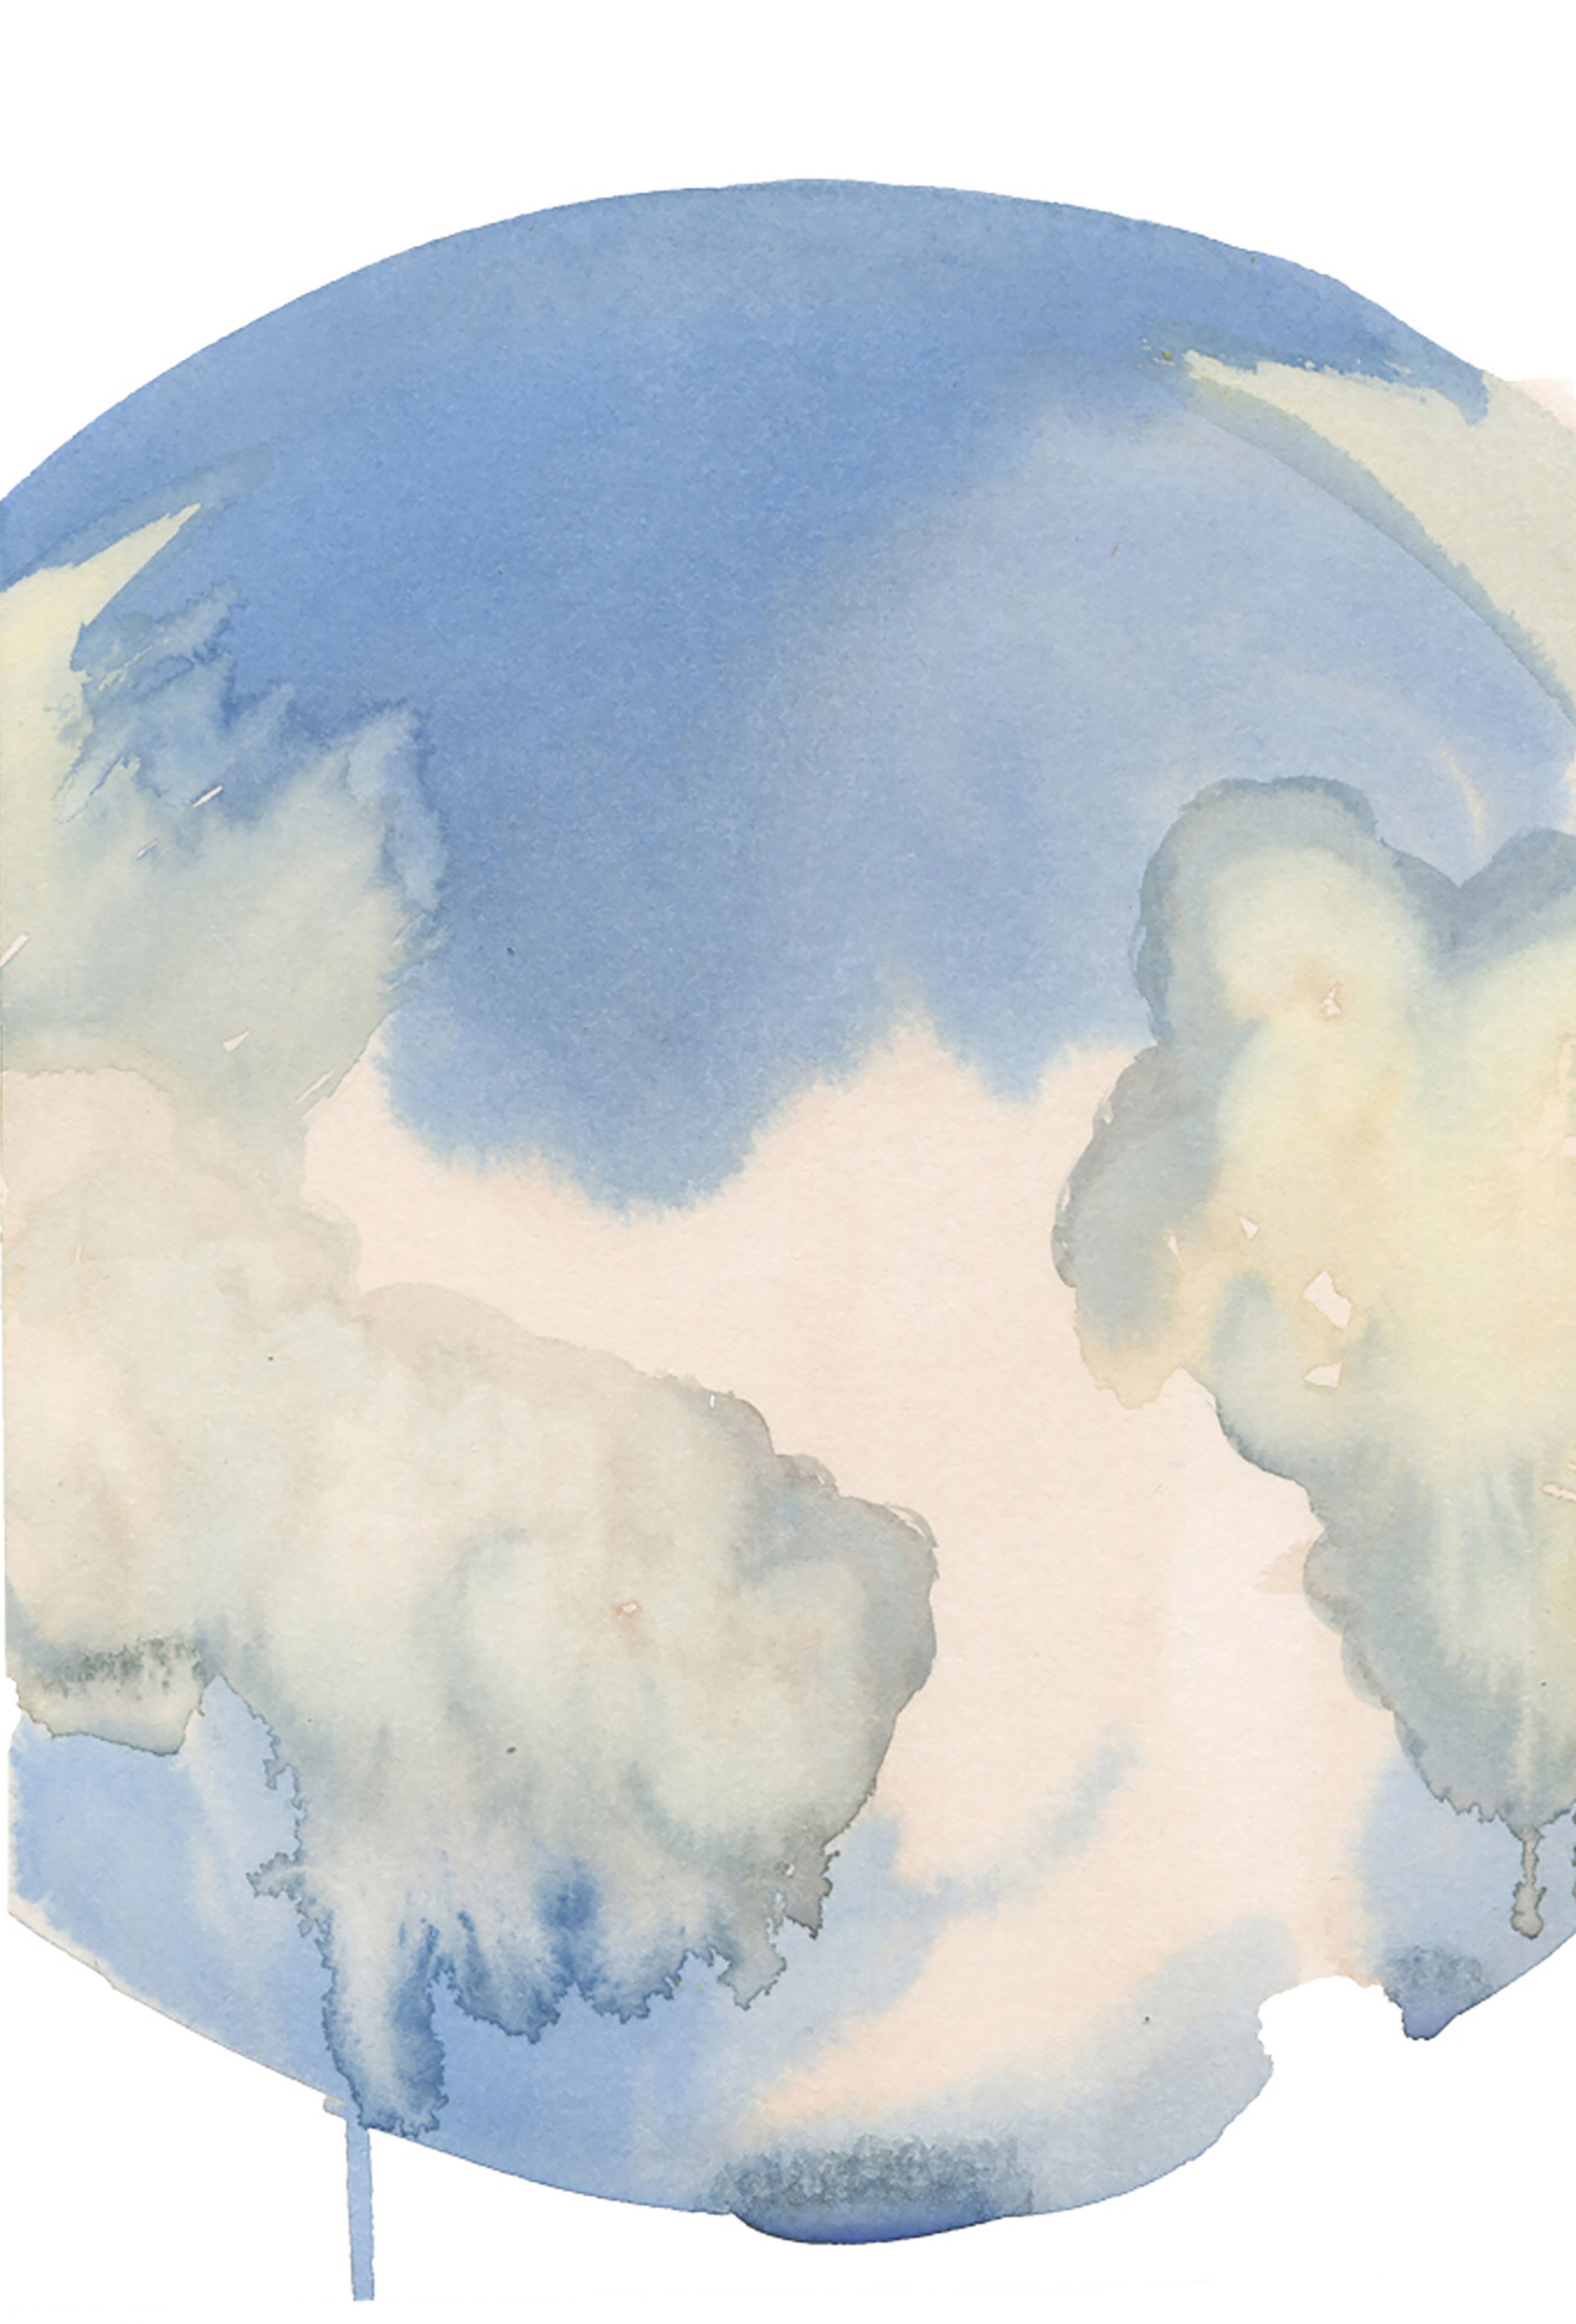 titania Seidl, painting, artwork, buy art online, austria